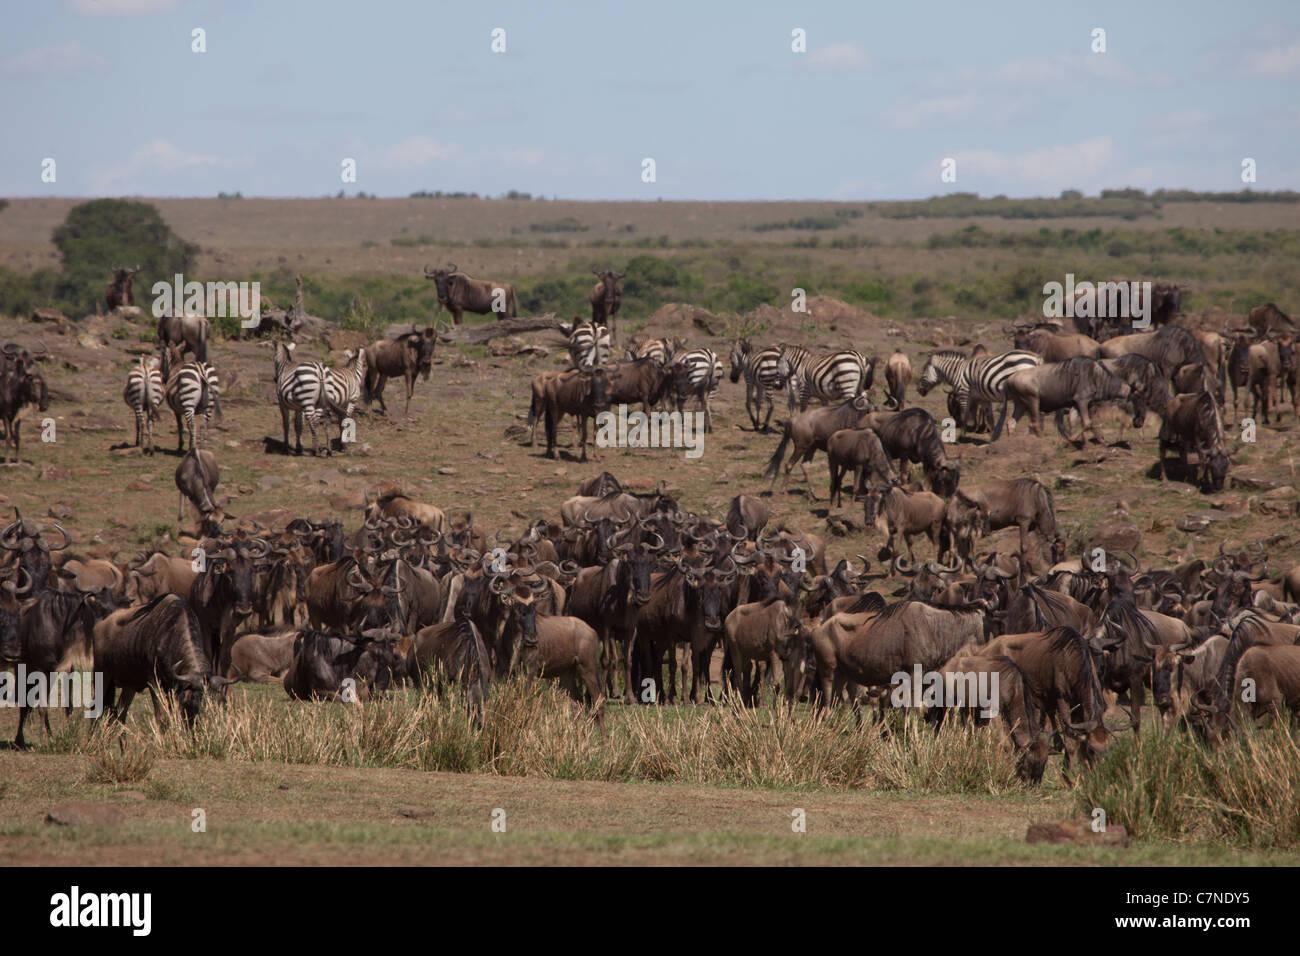 Wildebeest and Zebra before crossing the Mara River during the great migration, Masai Mara, Kenya, Africa Stock Photo